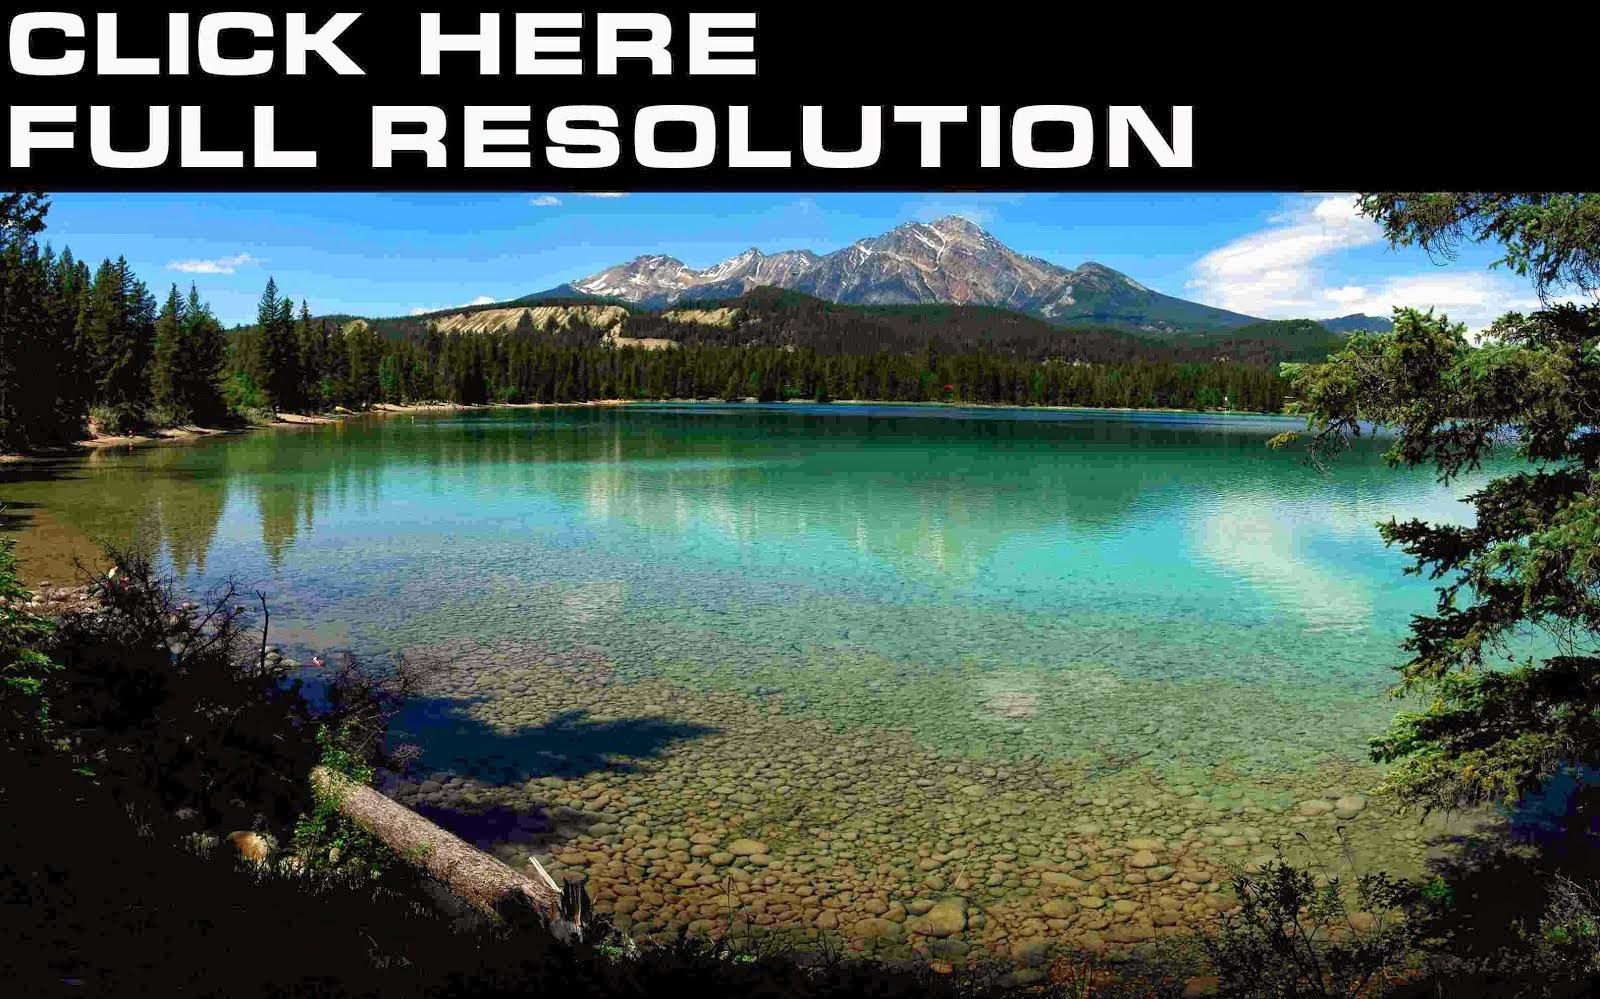 Edith Lake Jasper National Park Canada Wallpaper Hdwpics